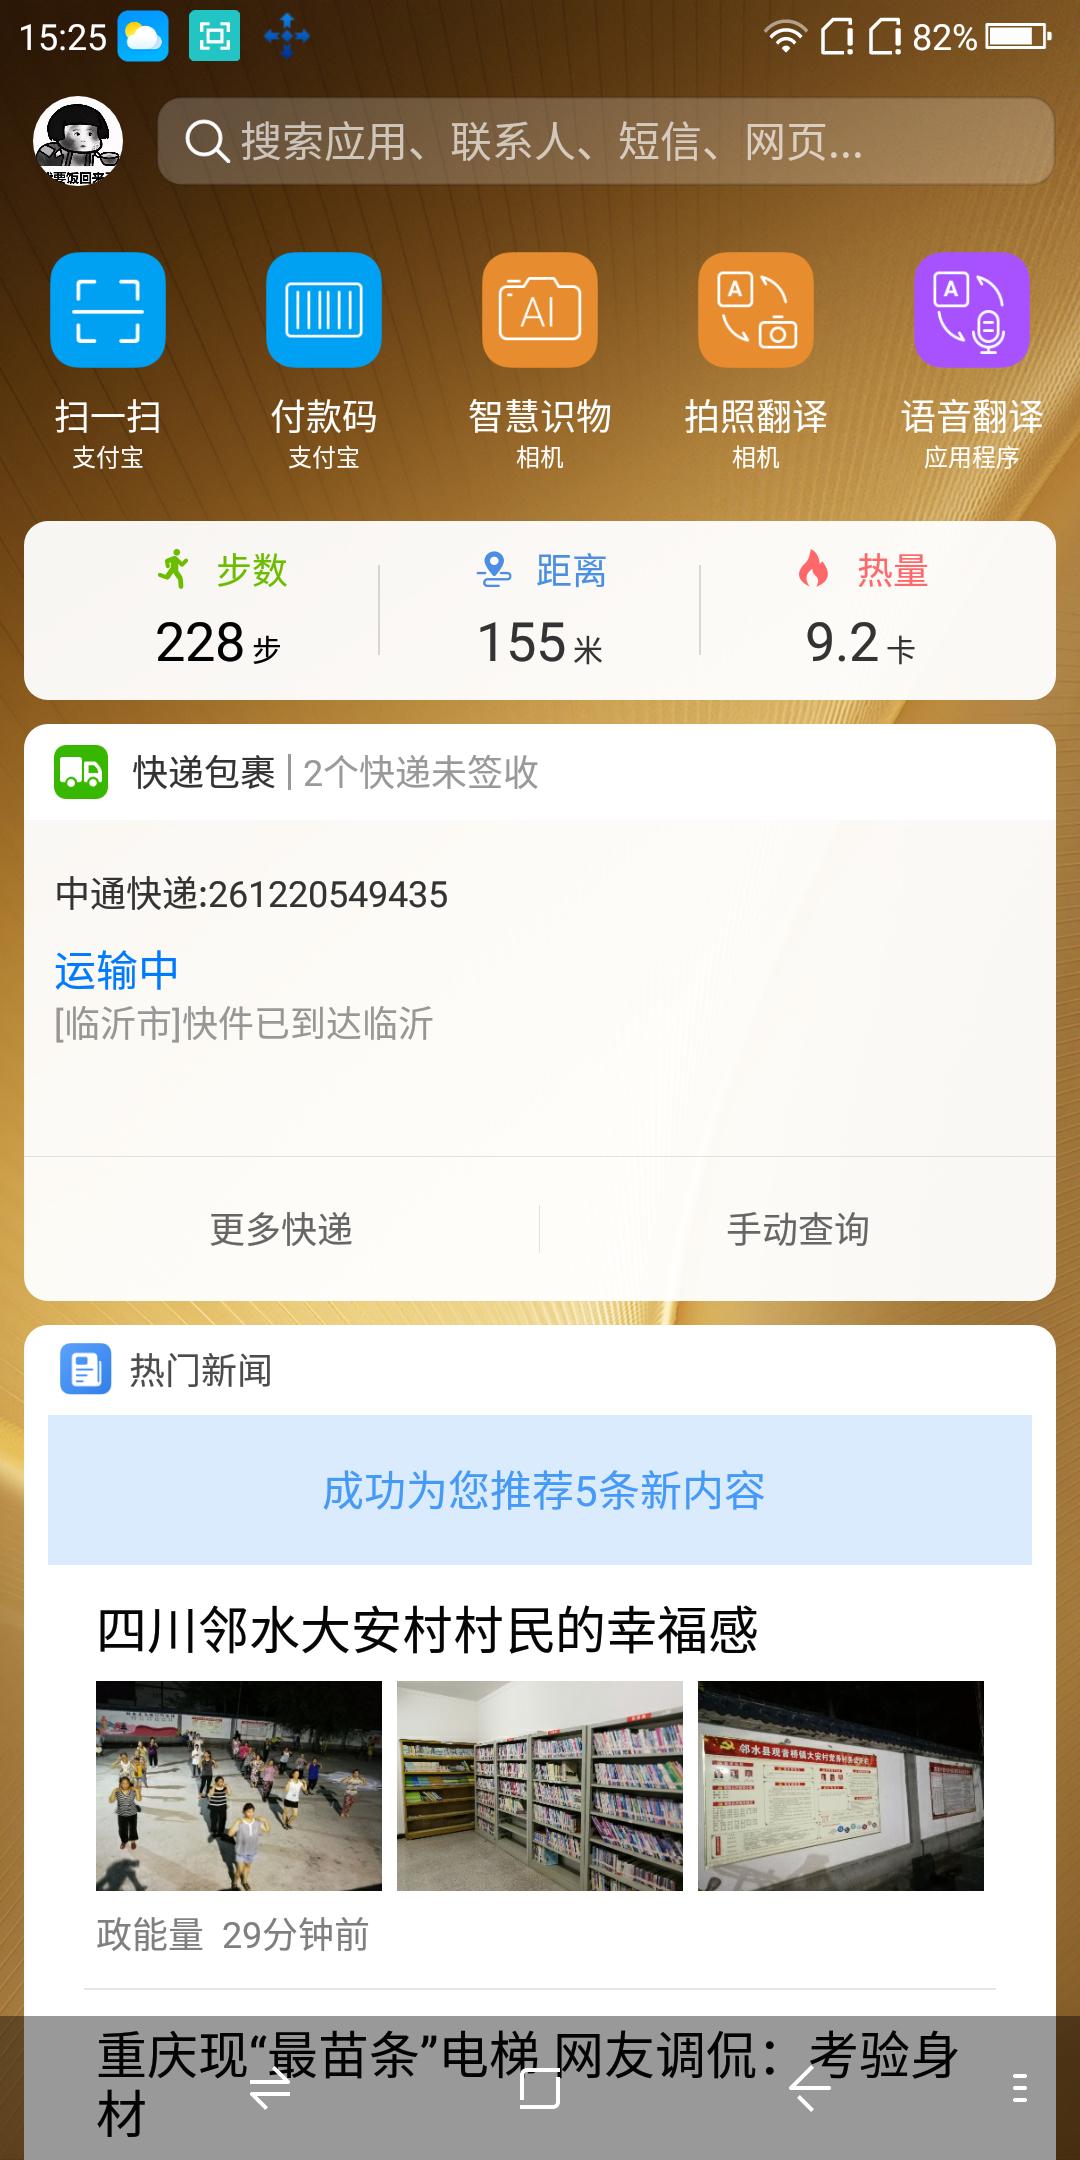 Screenshot_2018-08-21-15-25-41.png